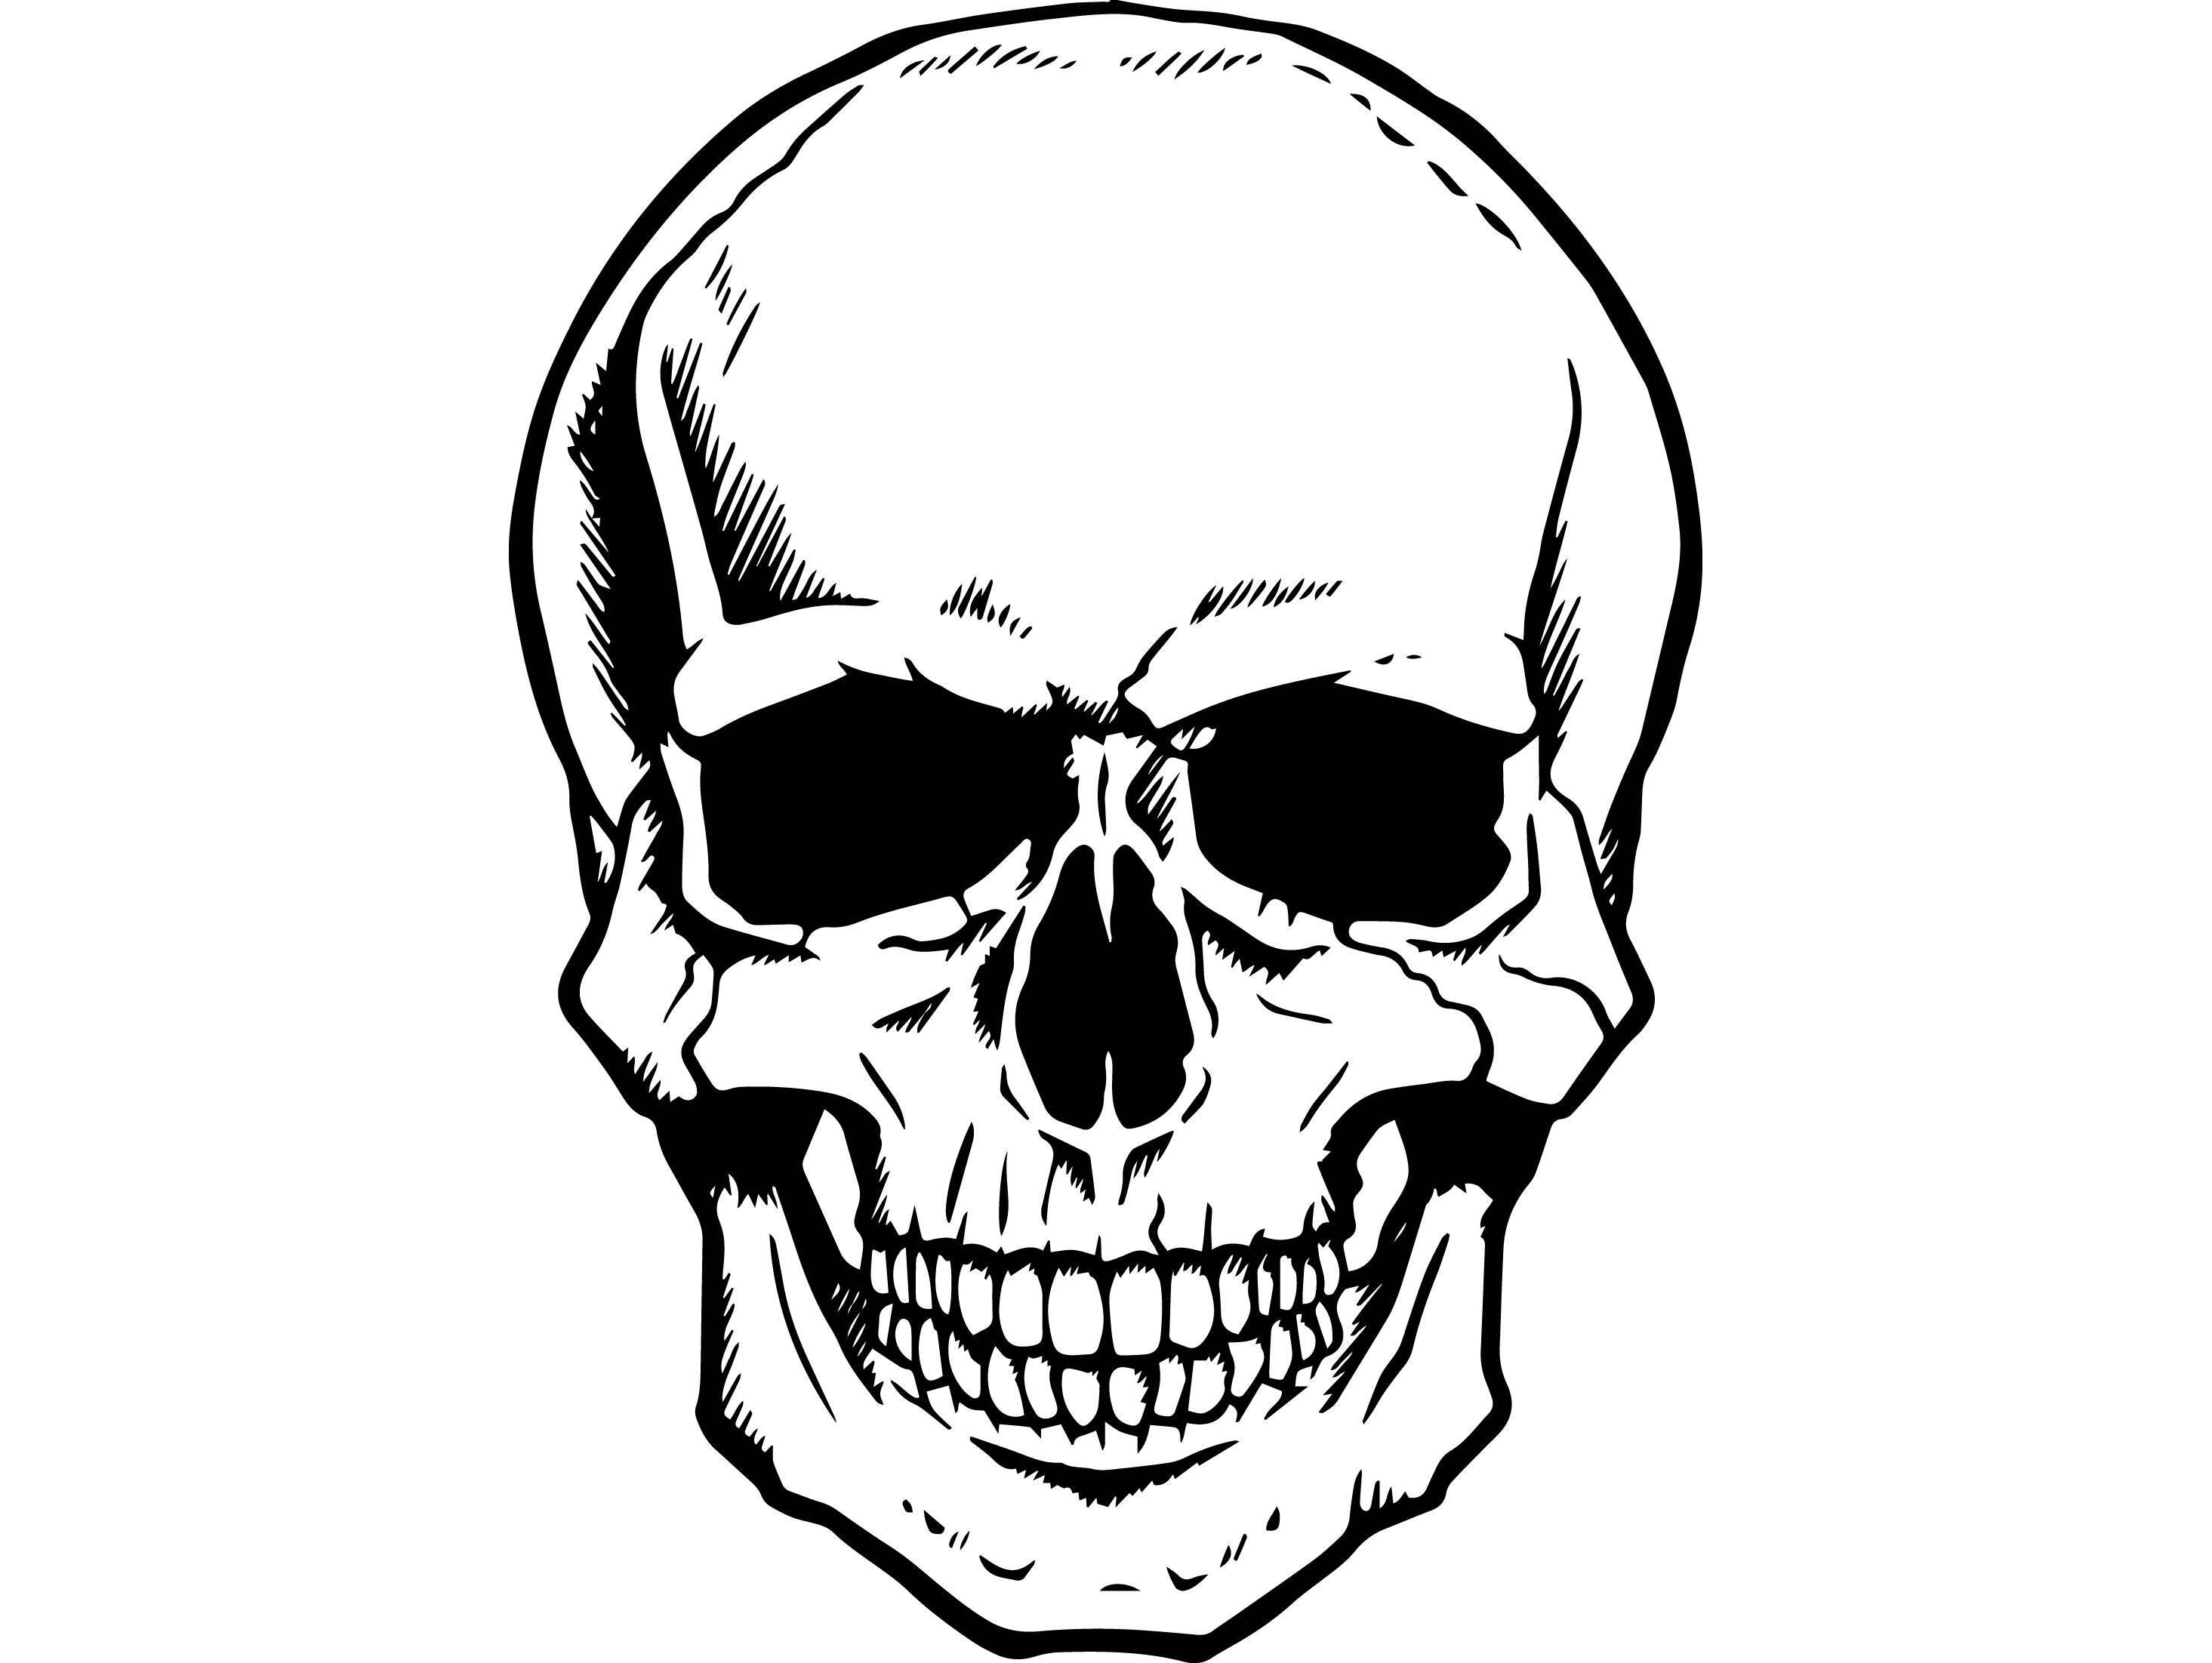 Skeleton head clipart 5 » Clipart Portal.